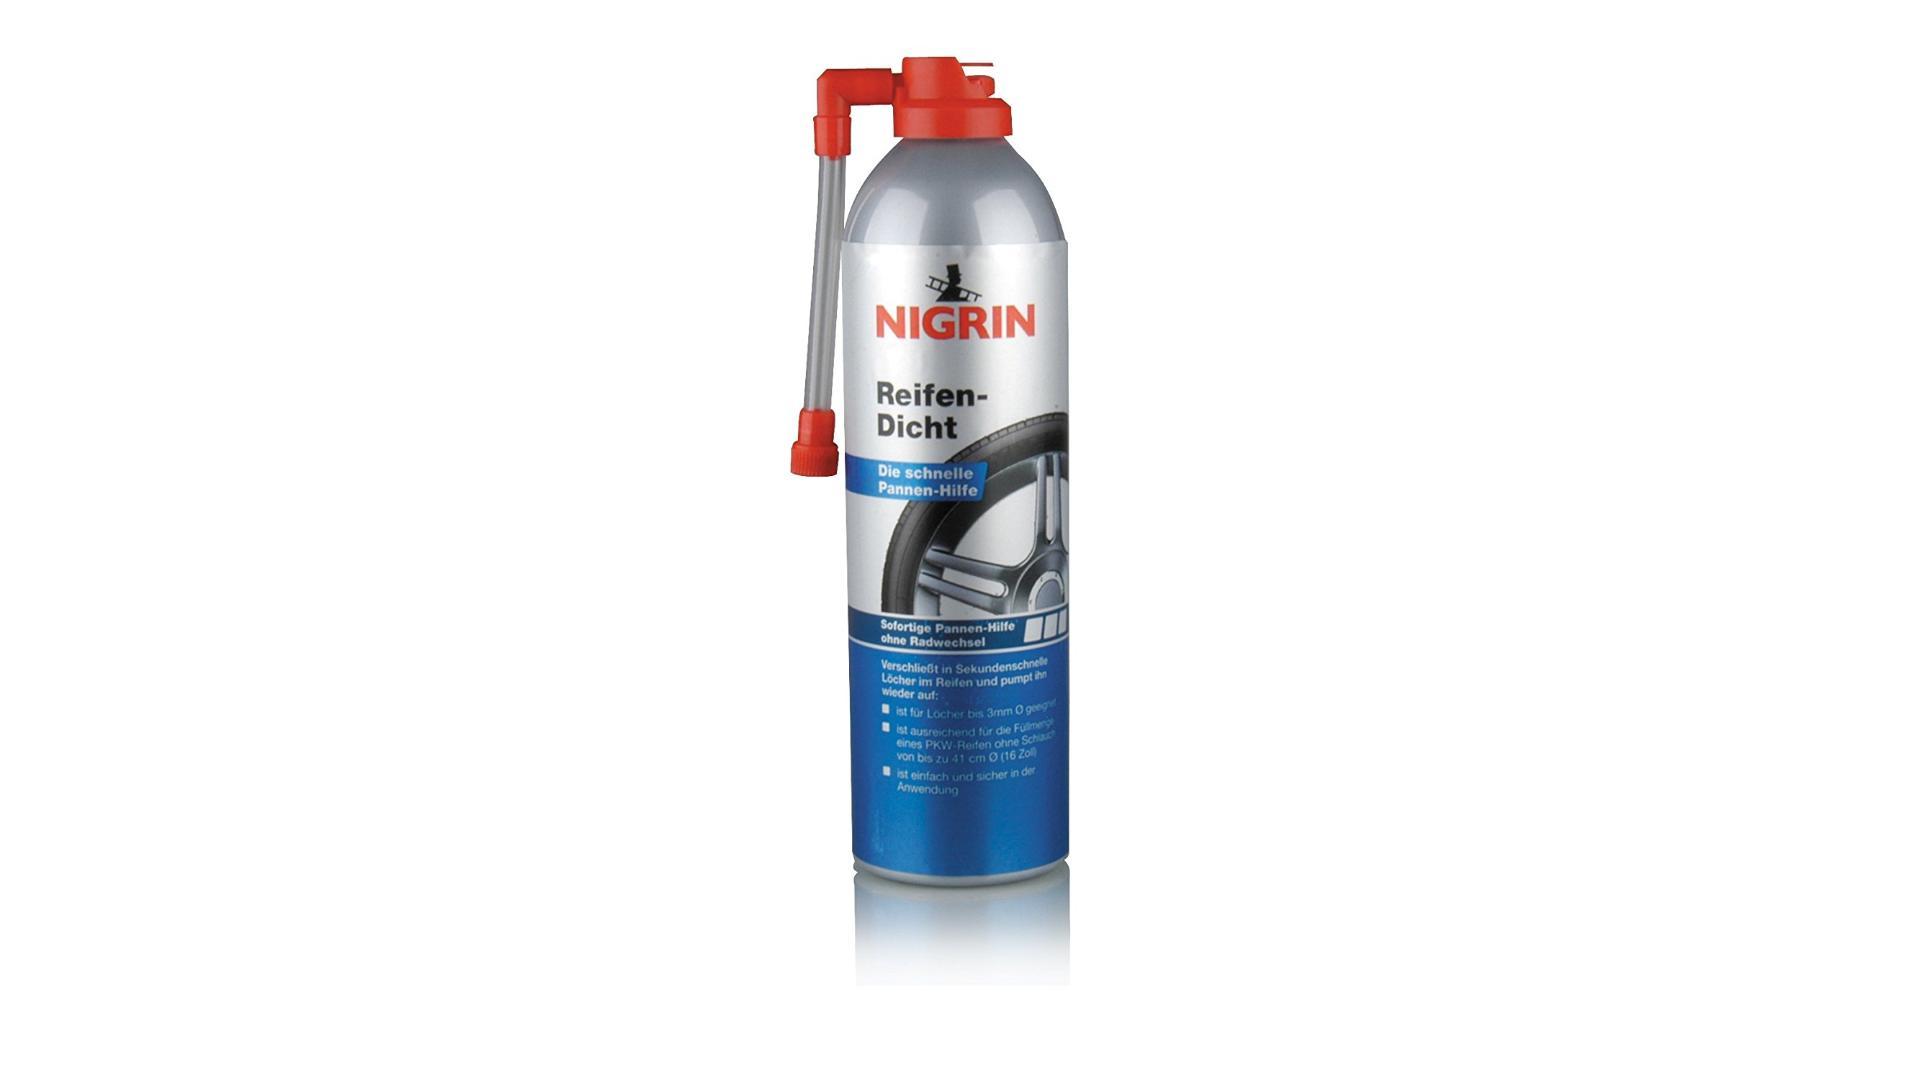 NIGRIN Defective Spray 500ml